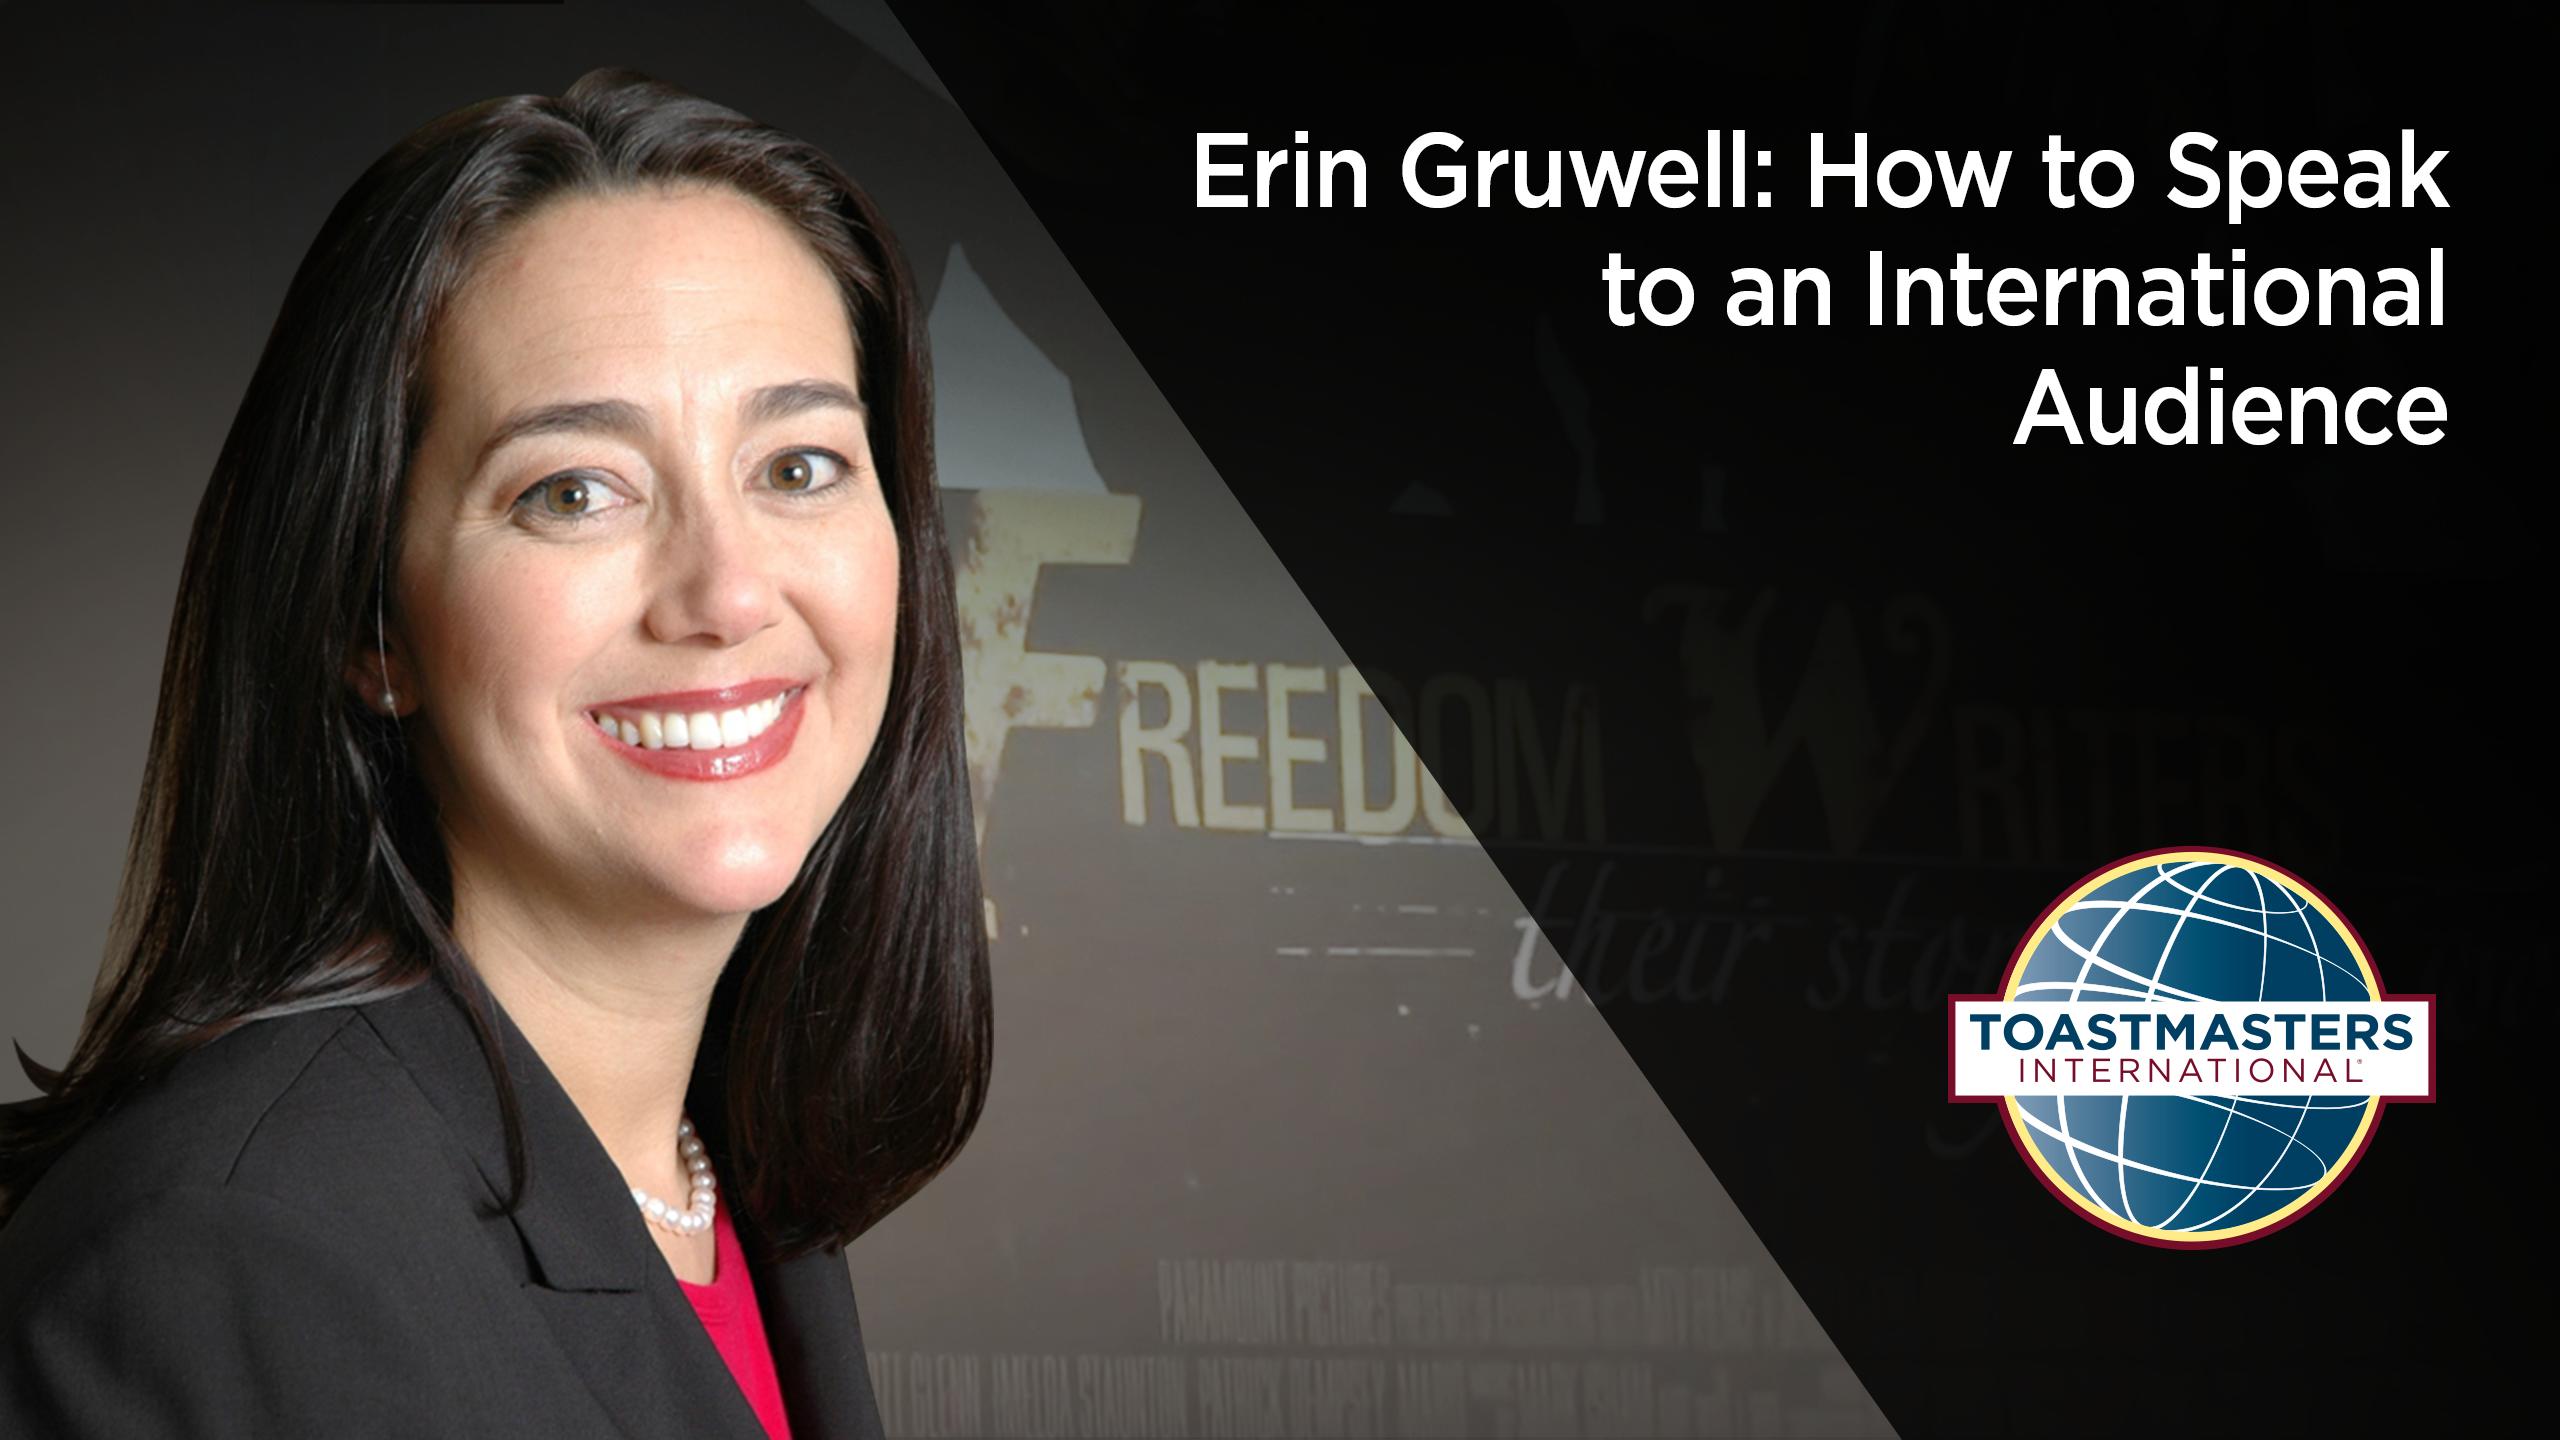 Erin-Gruwell-How-to-Speak-to-an-International-Audience